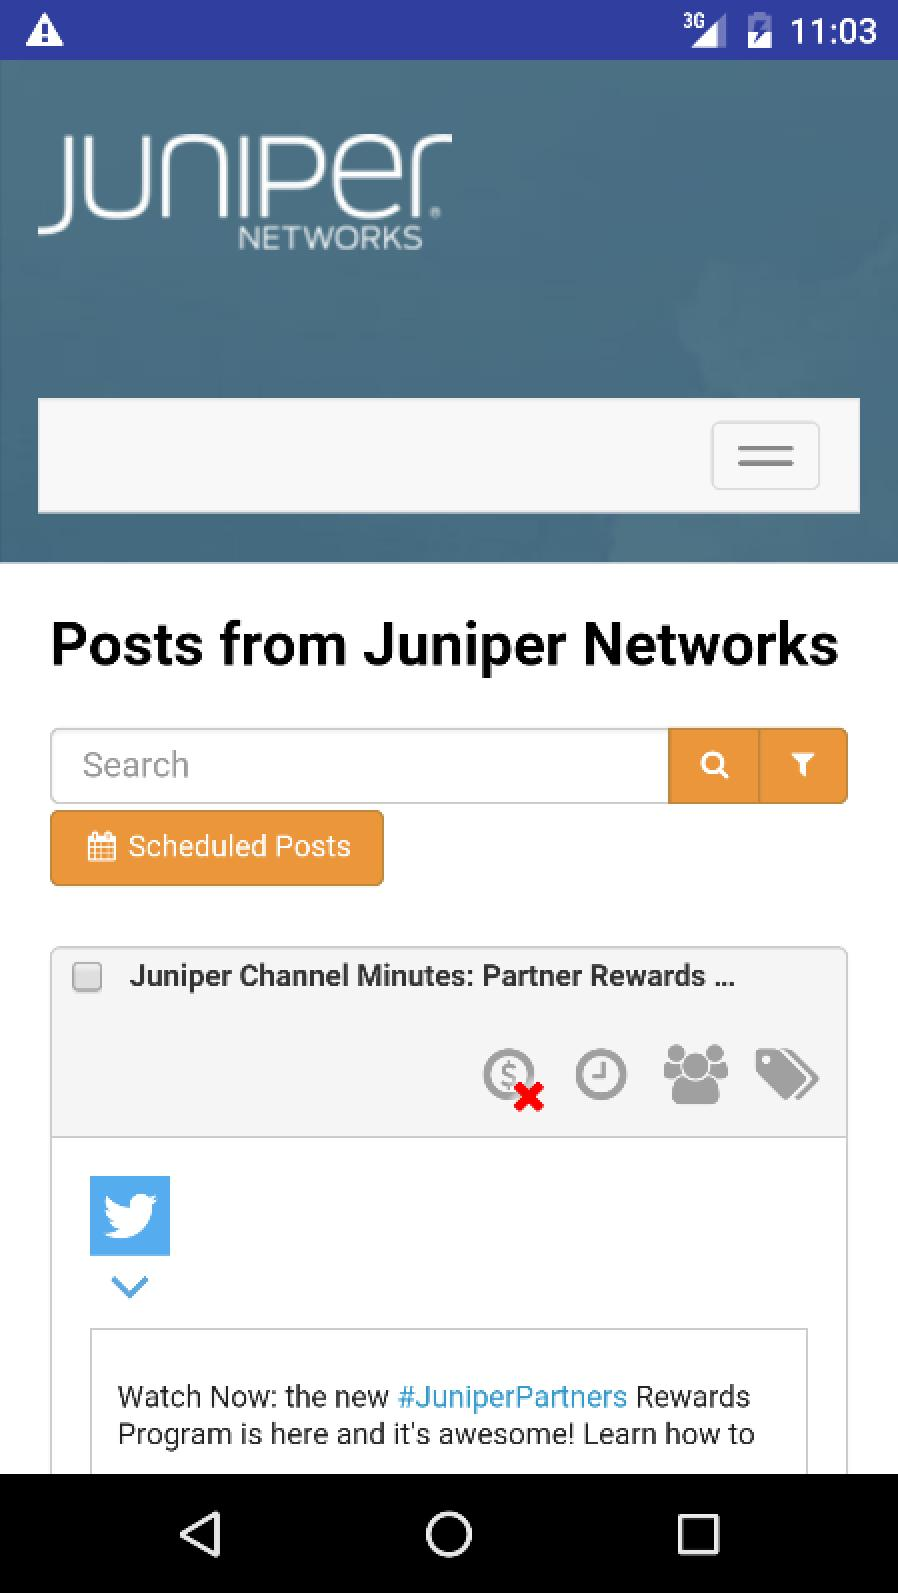 Juniper Networks Social for Android - APK Download